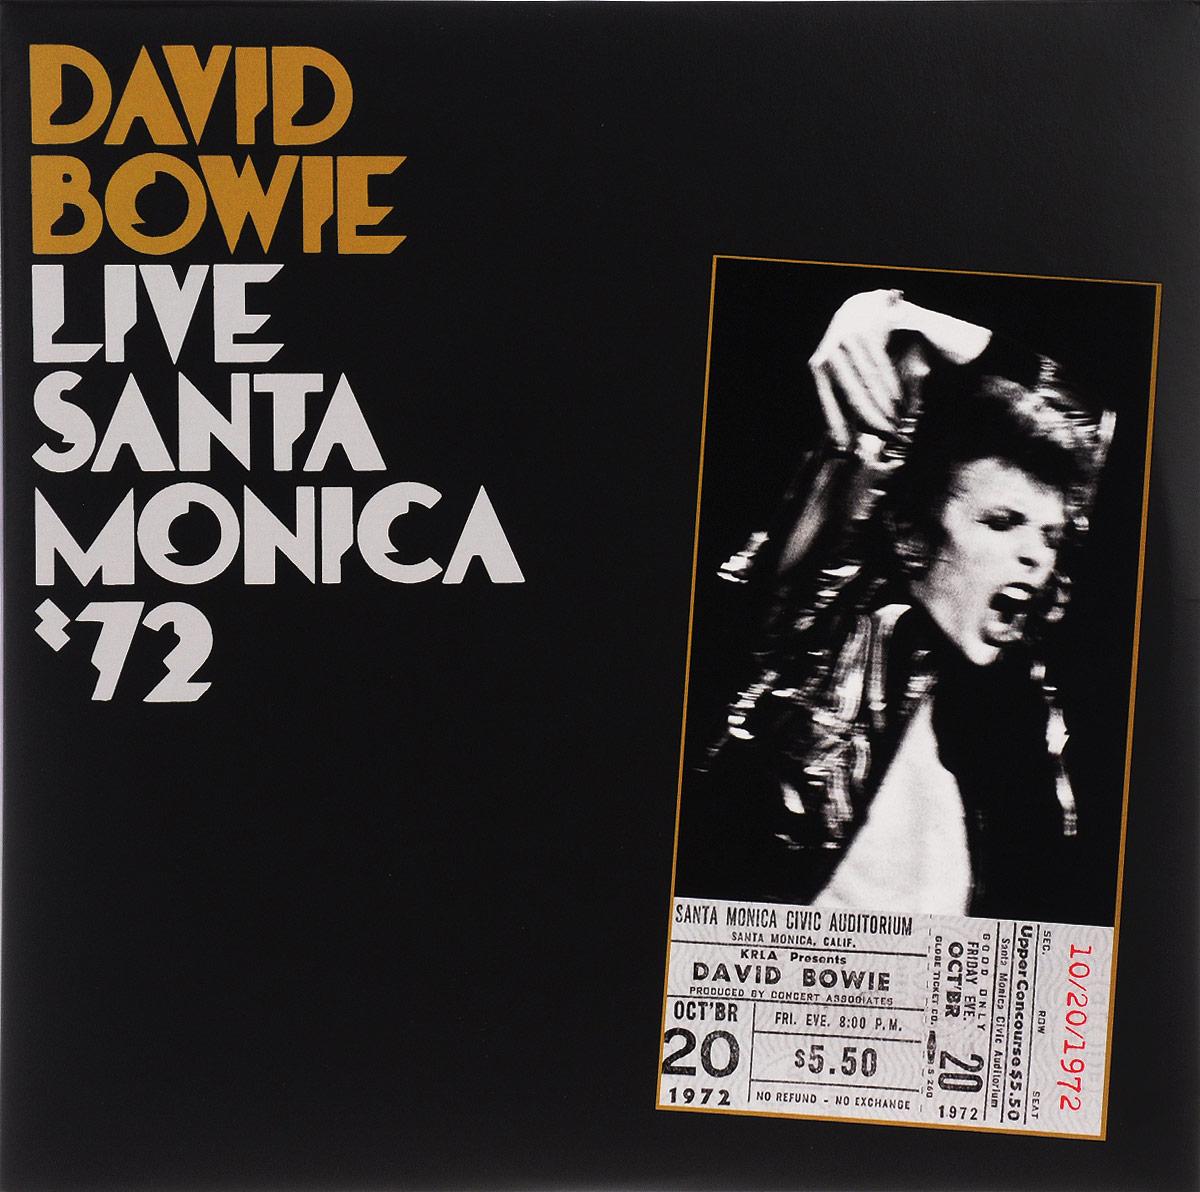 Дэвид Боуи David Bowie. Live Santa Monica '72 (2 LP)